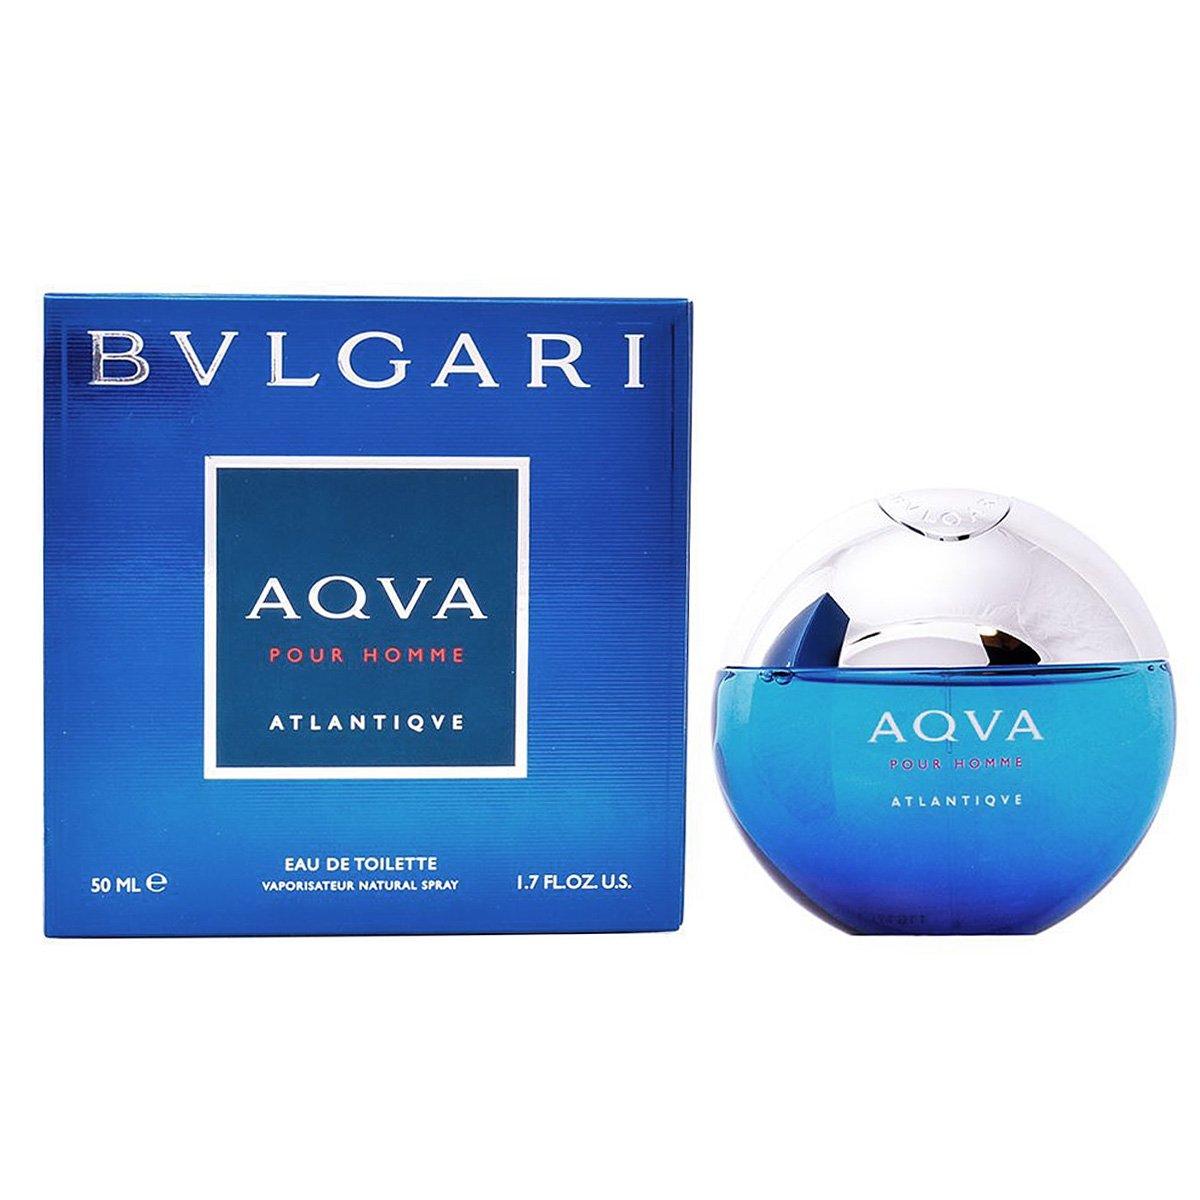 Туалетная вода Bvlgari Aqua ATLANTIQUE для мужчин 100 мл. (тестер)